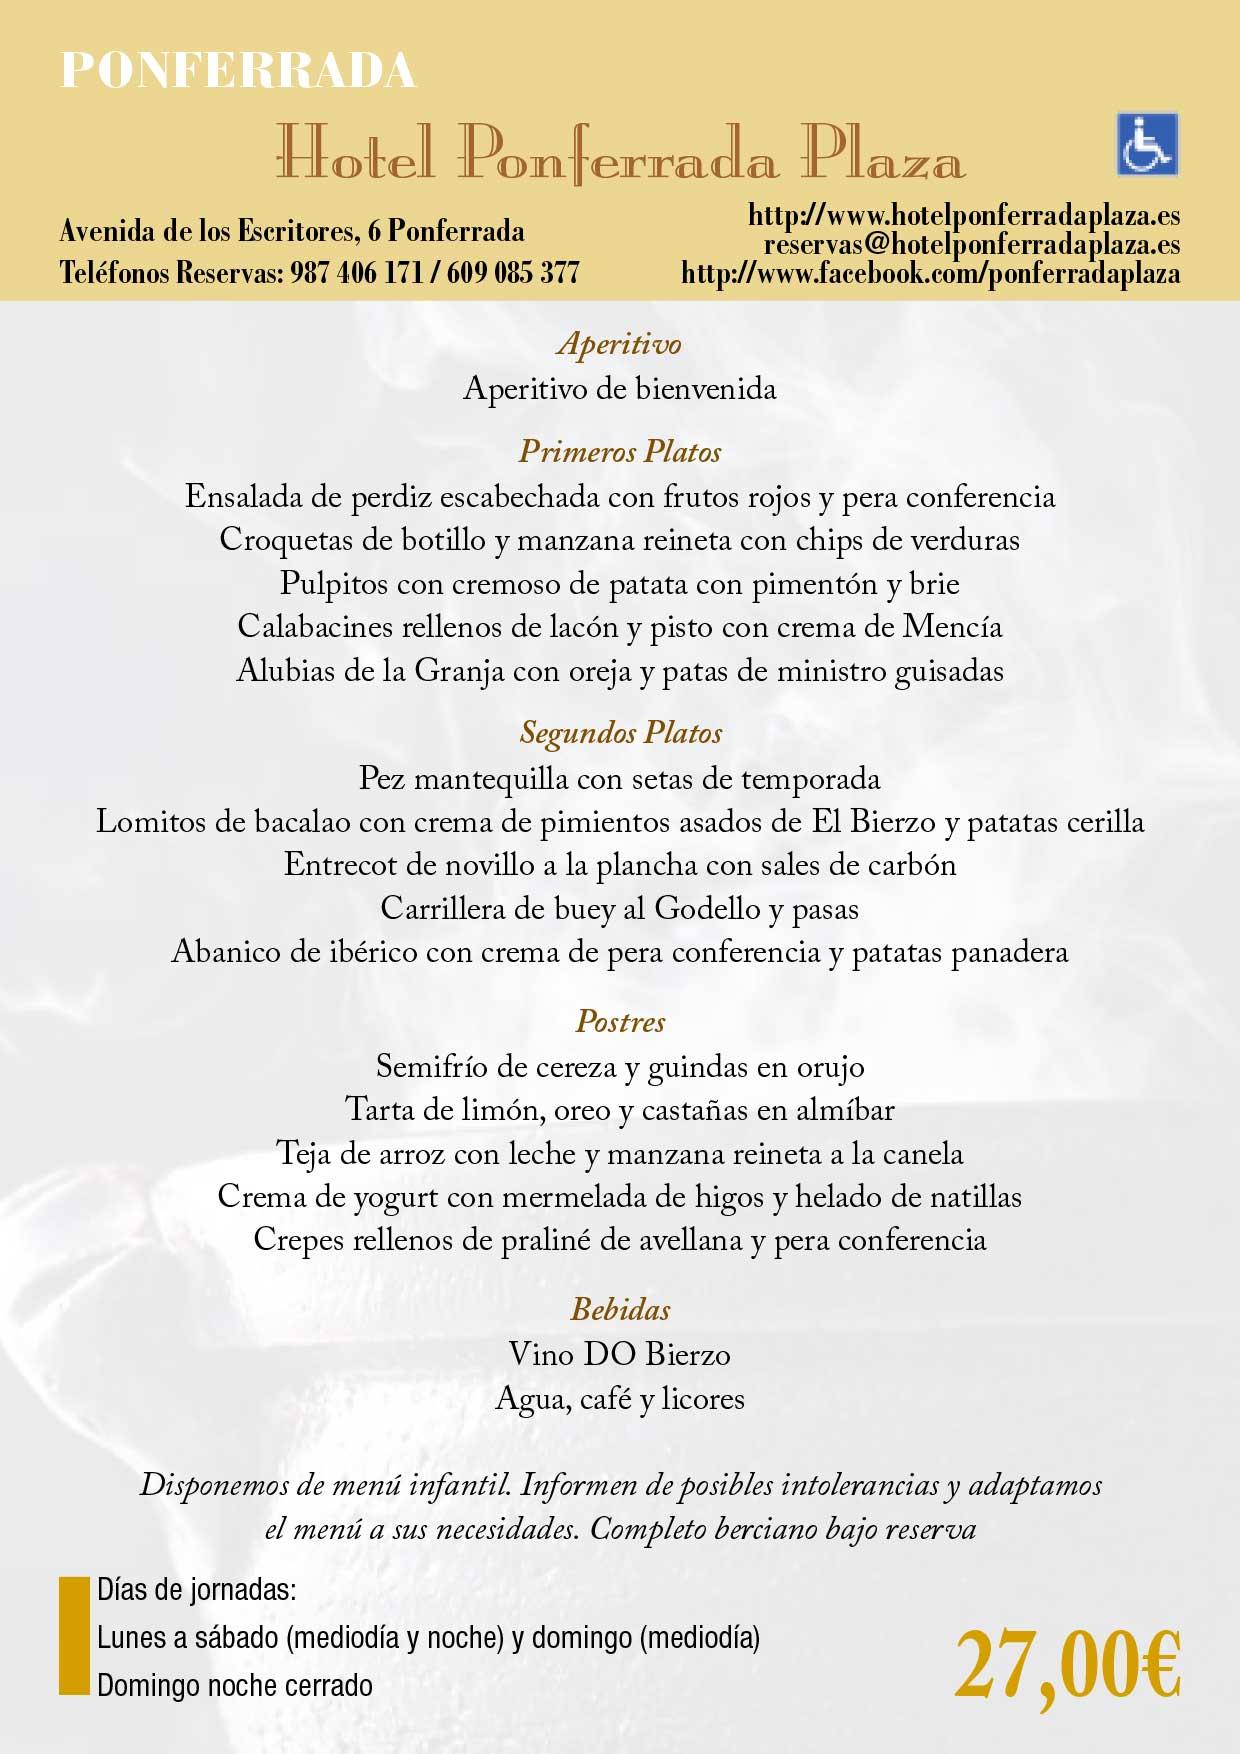 XXXIII Jornadas gastronómicas del Bierzo 2017. Restaurantes participantes 22